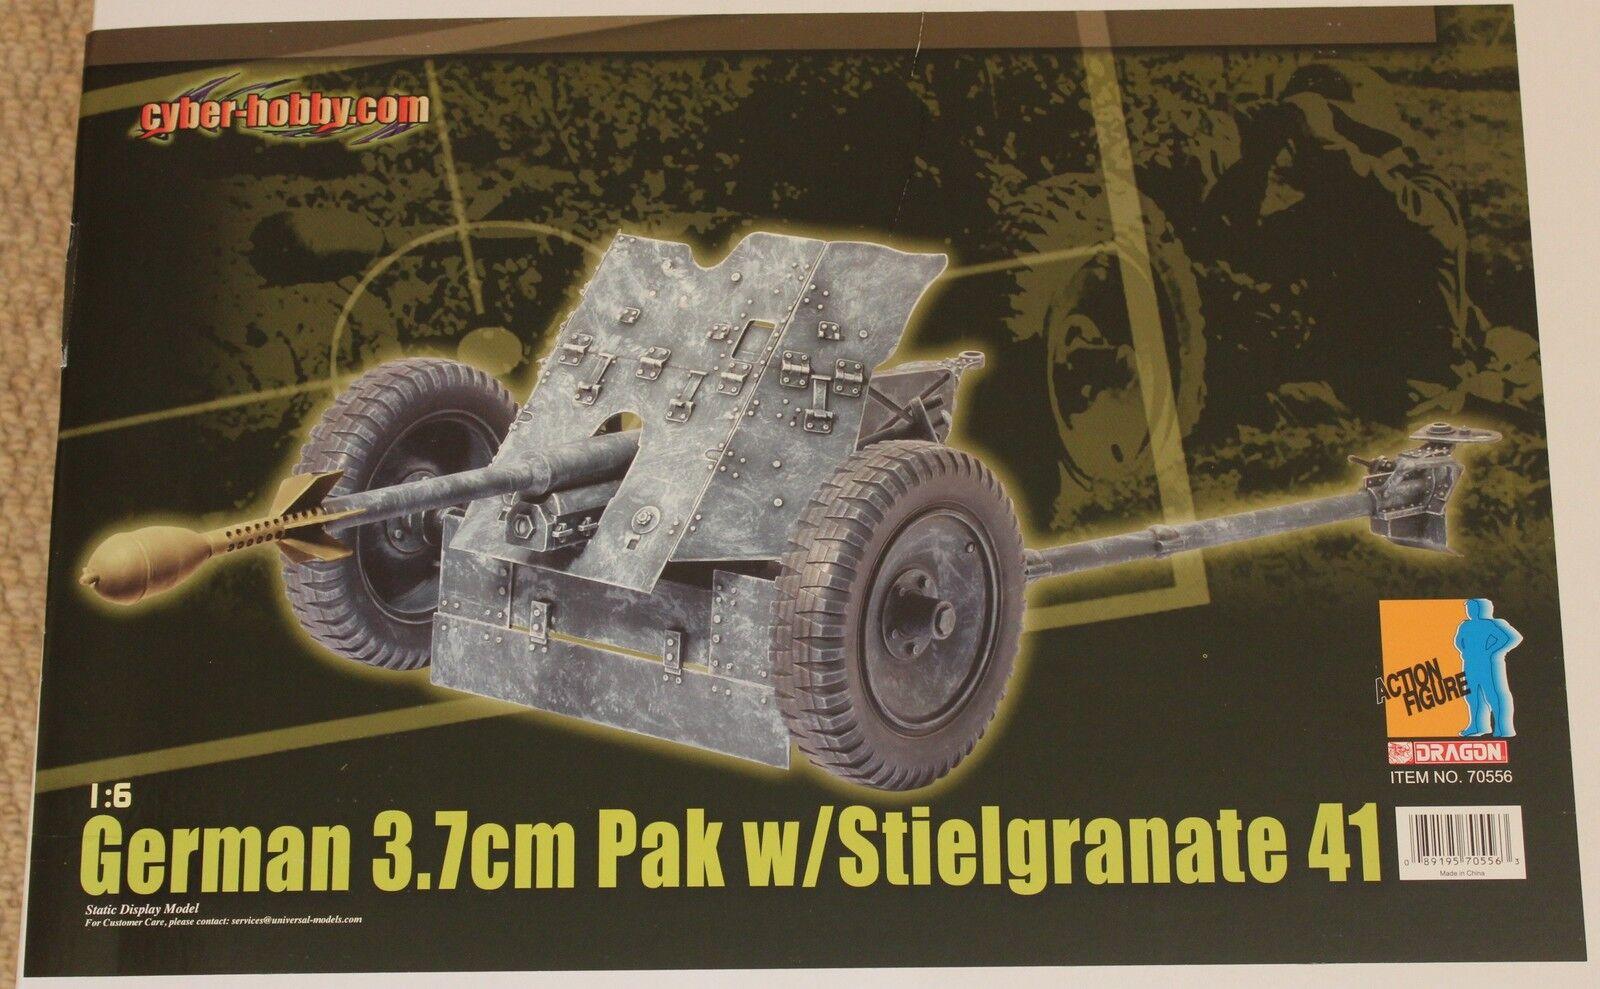 Cyber hobby dragon  german brandt 73.7 cm pak 1 6 12'' boxed  did hot toy ww11